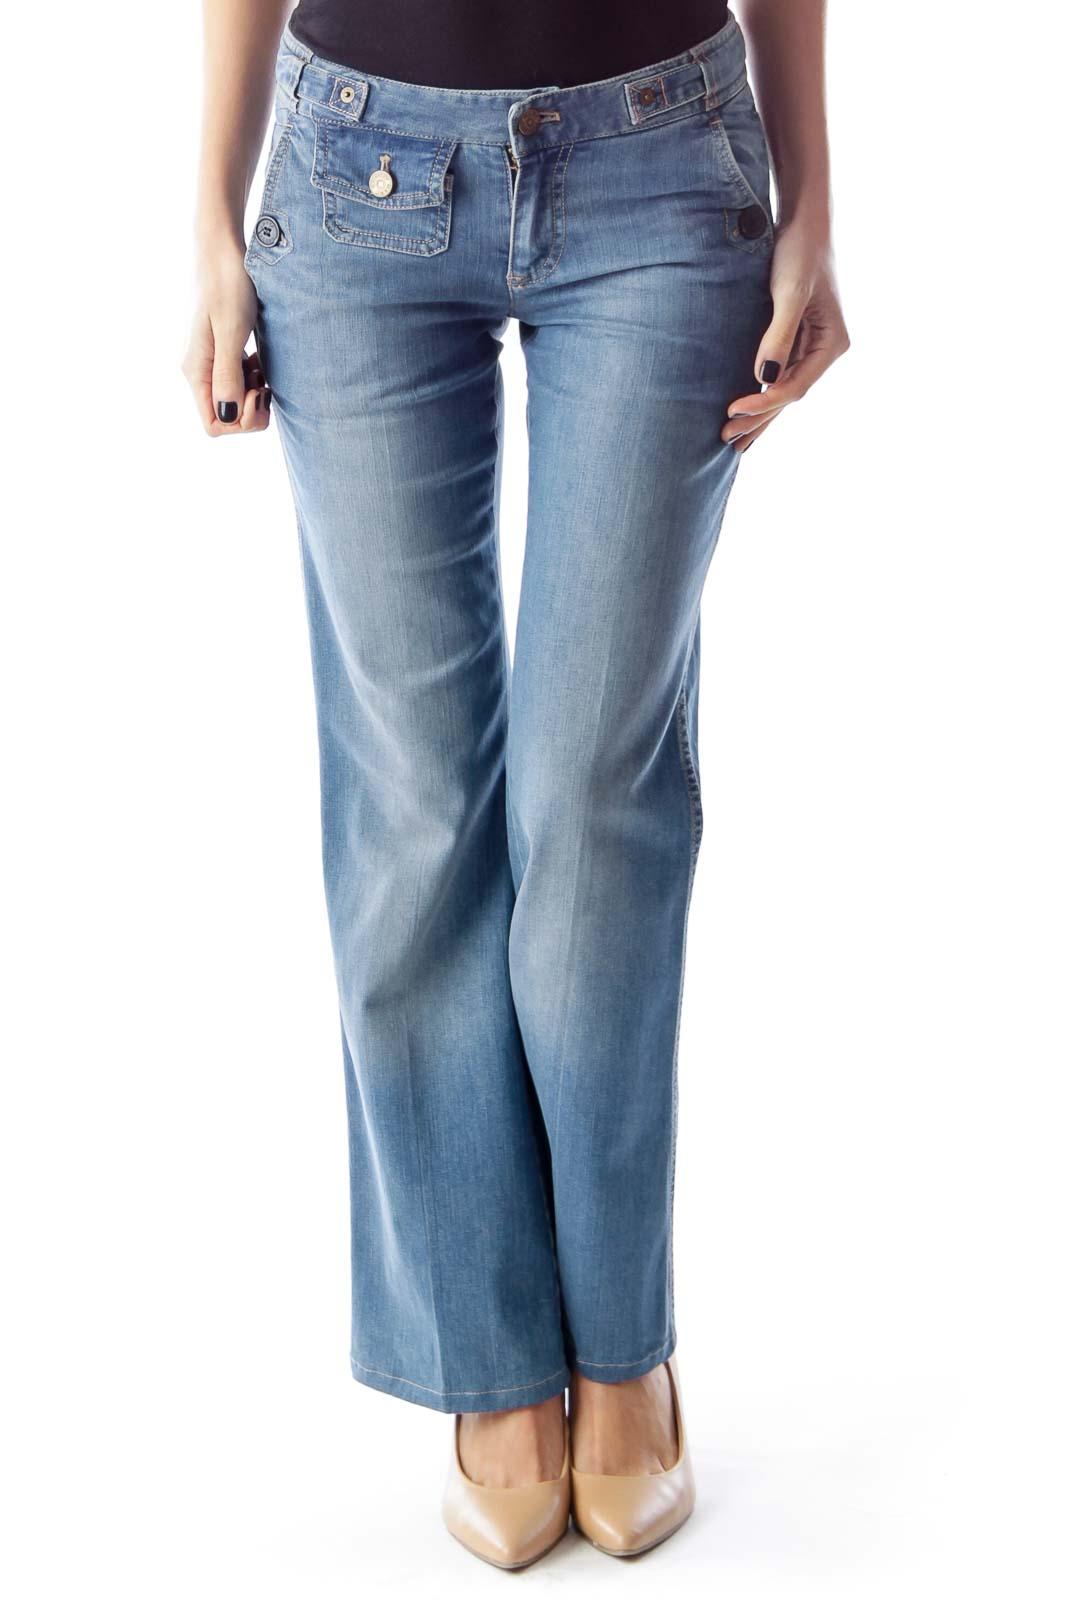 Light Blue Flare Jeans